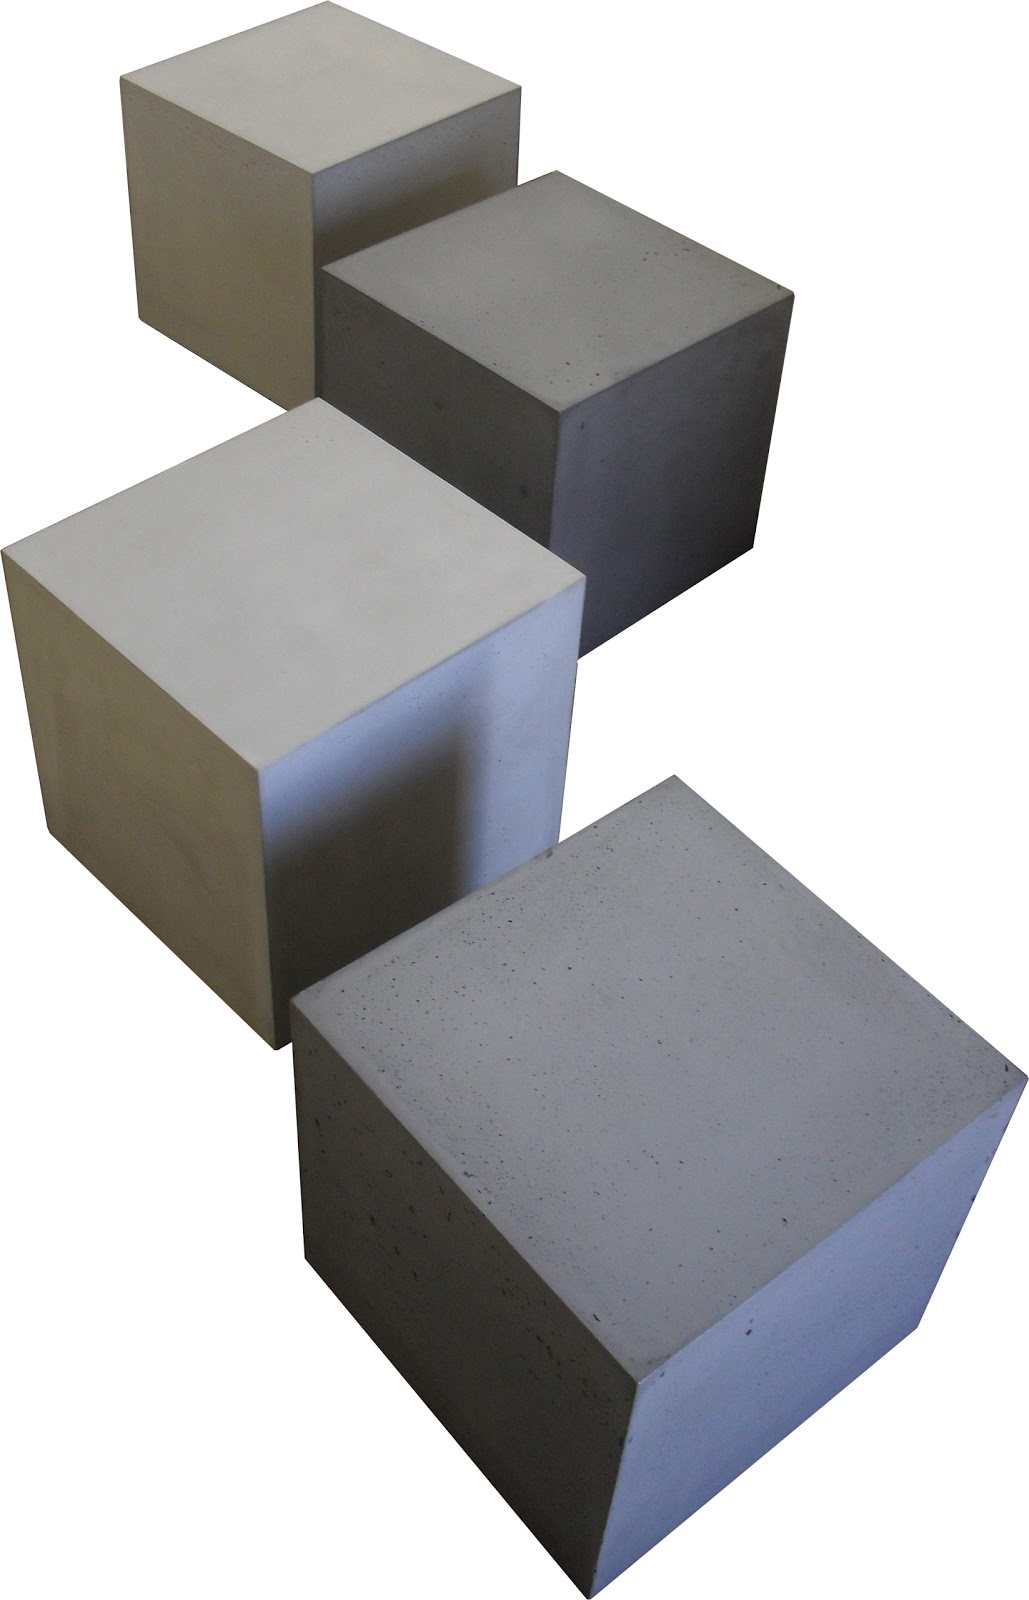 Table beton le cube concrete by lcda multitaches - Beton lcda ...